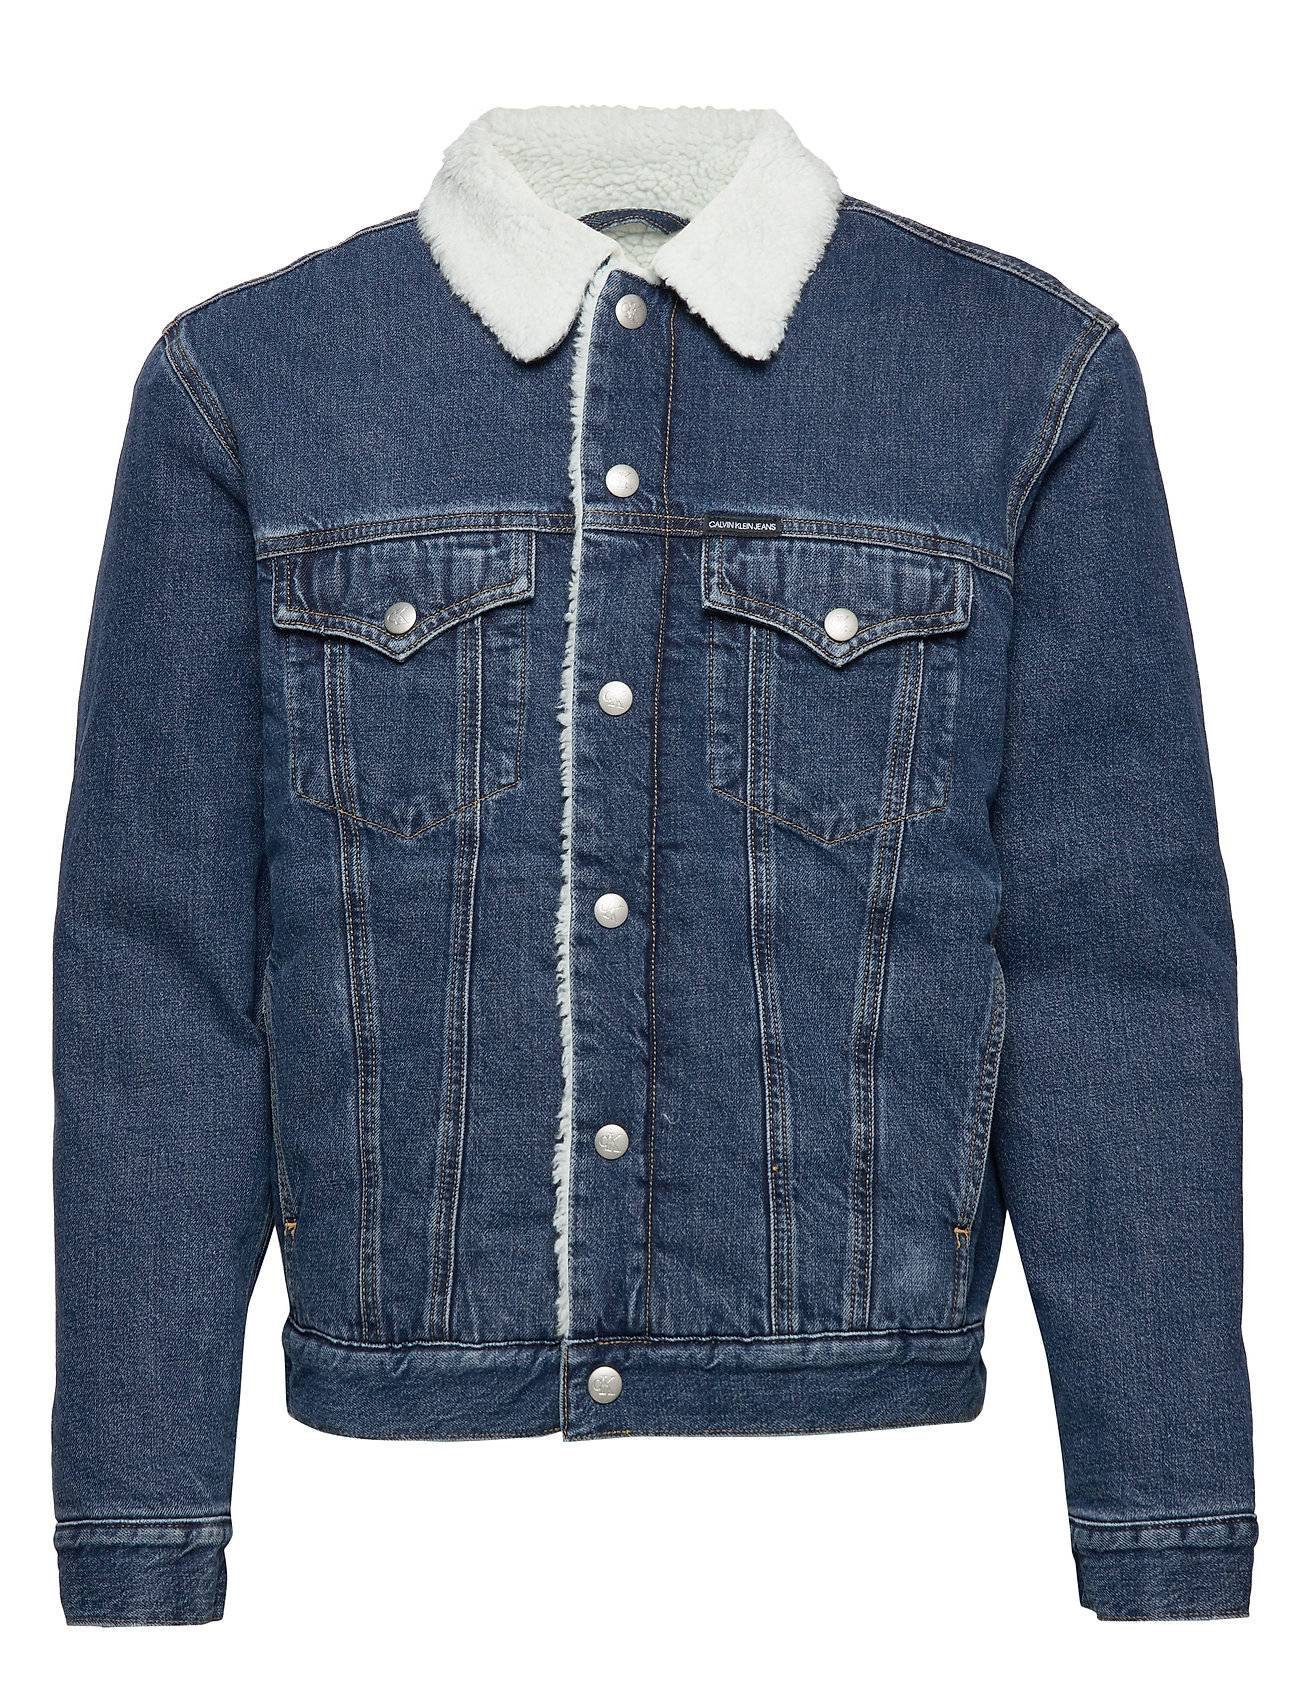 Image of Calvin Sherpa Foundation Denim Jacket Farkkutakki Denimtakki Sininen Calvin Klein Jeans